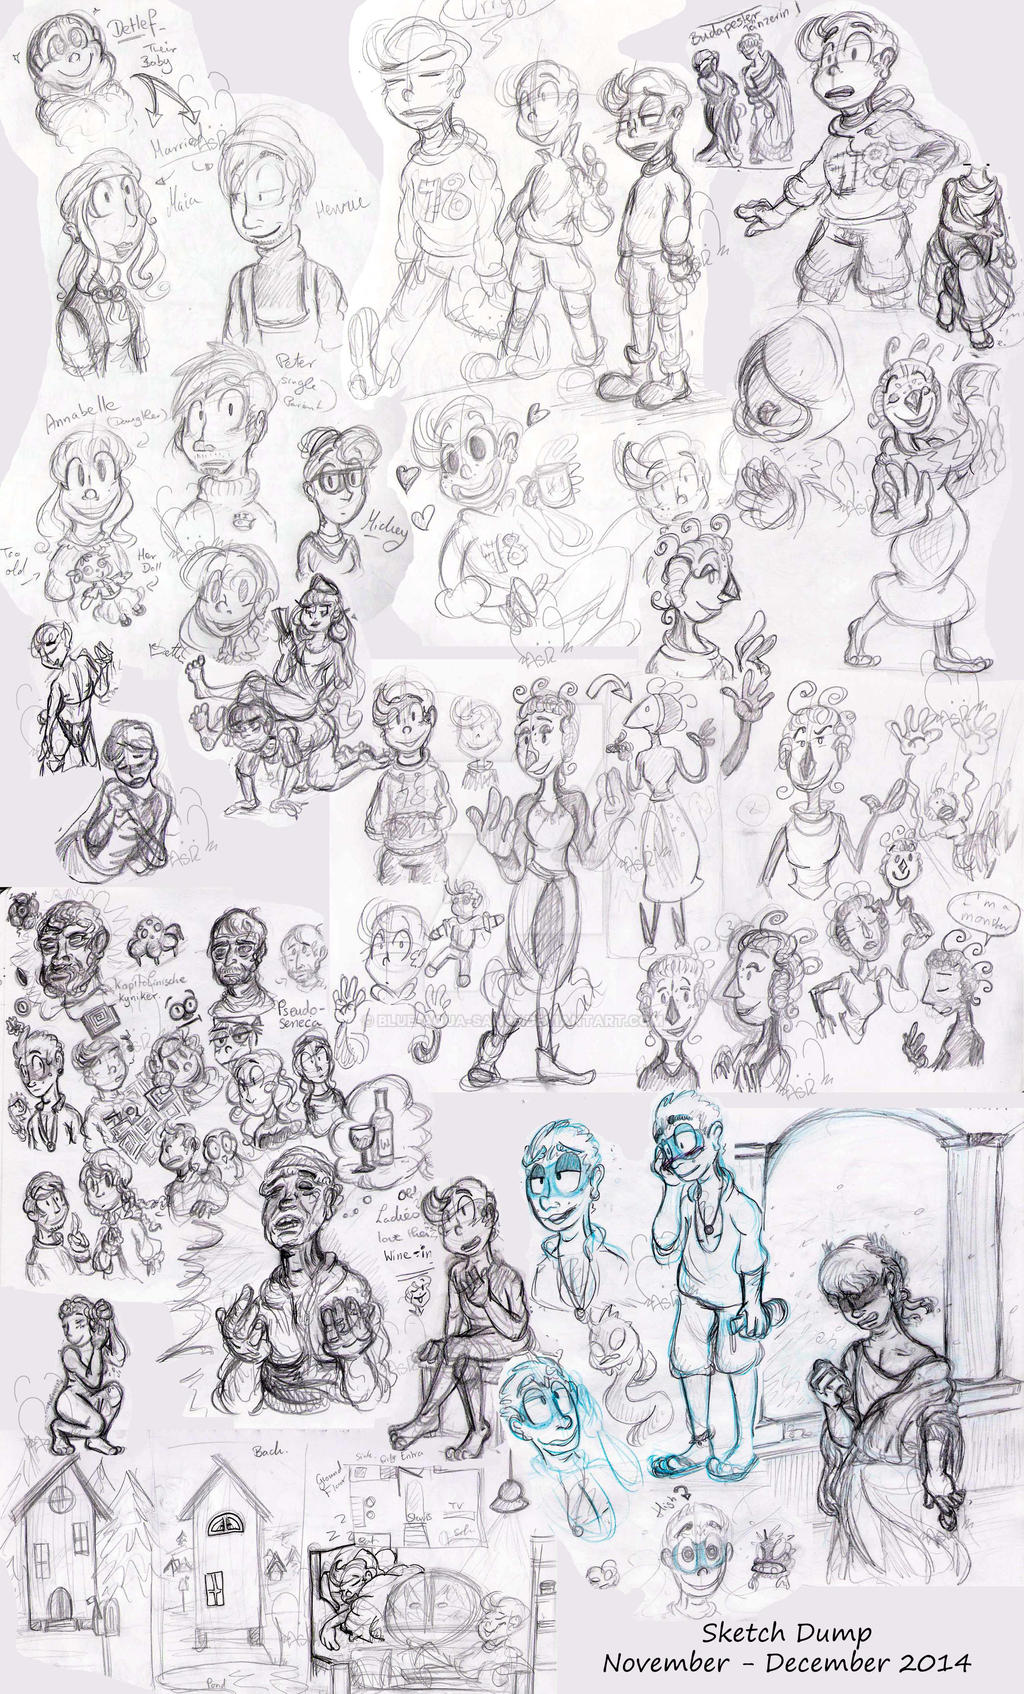 Sketch dump November-December 2014 by Blue-Aqua-san95